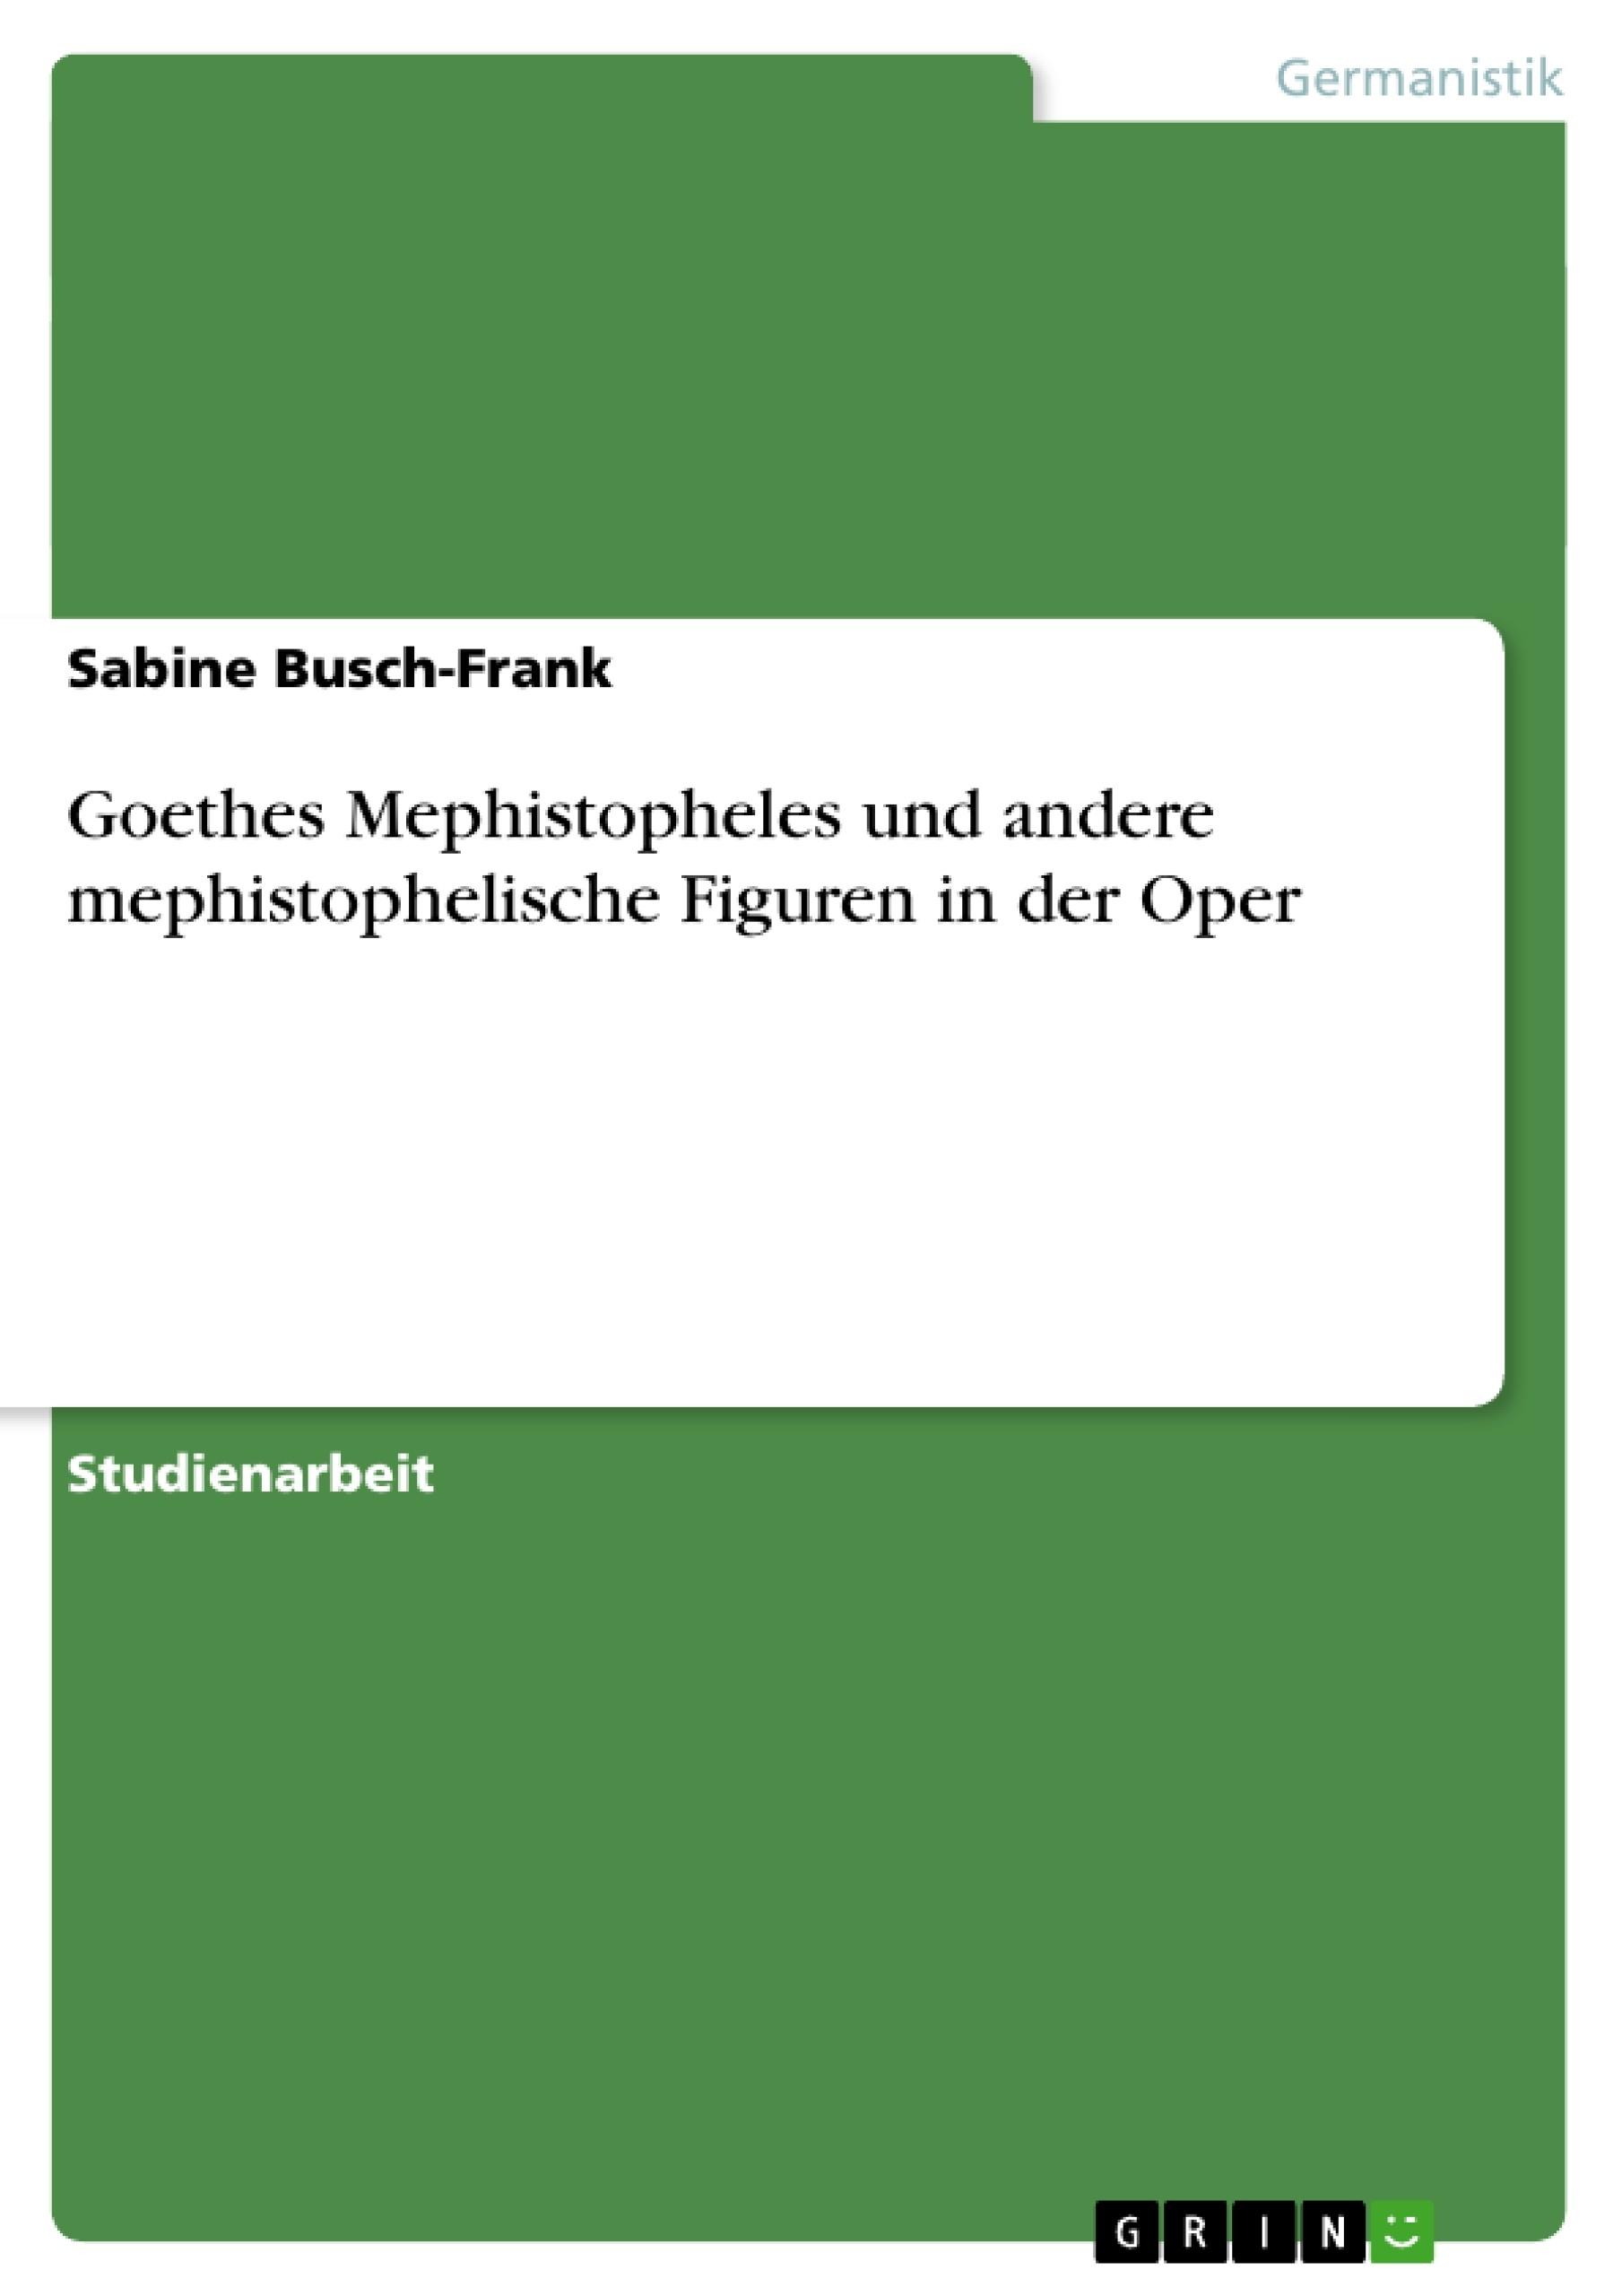 Titel: Goethes Mephistopheles und andere mephistophelische Figuren in der Oper